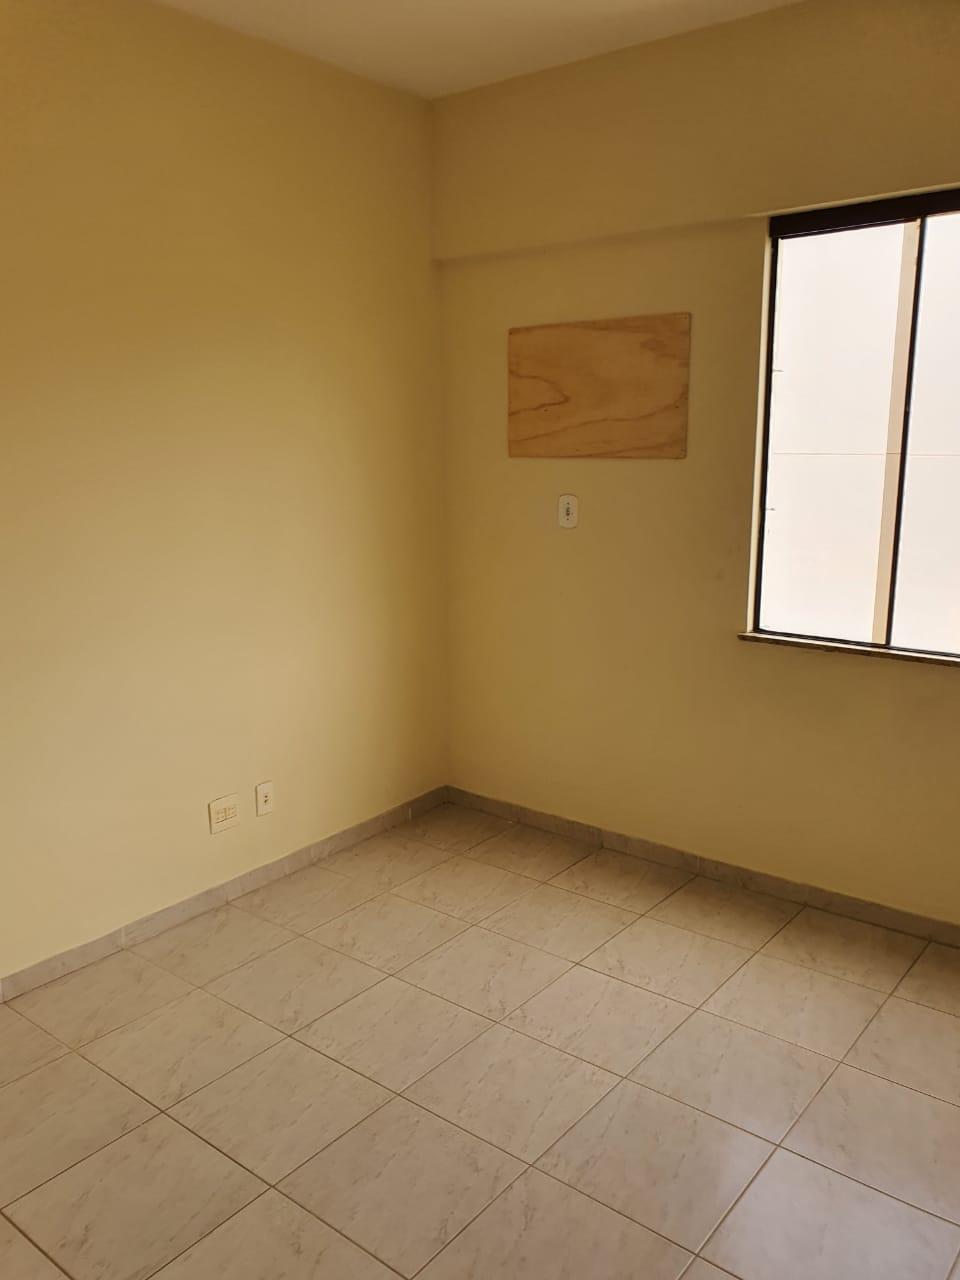 Residencial lilian 209 03